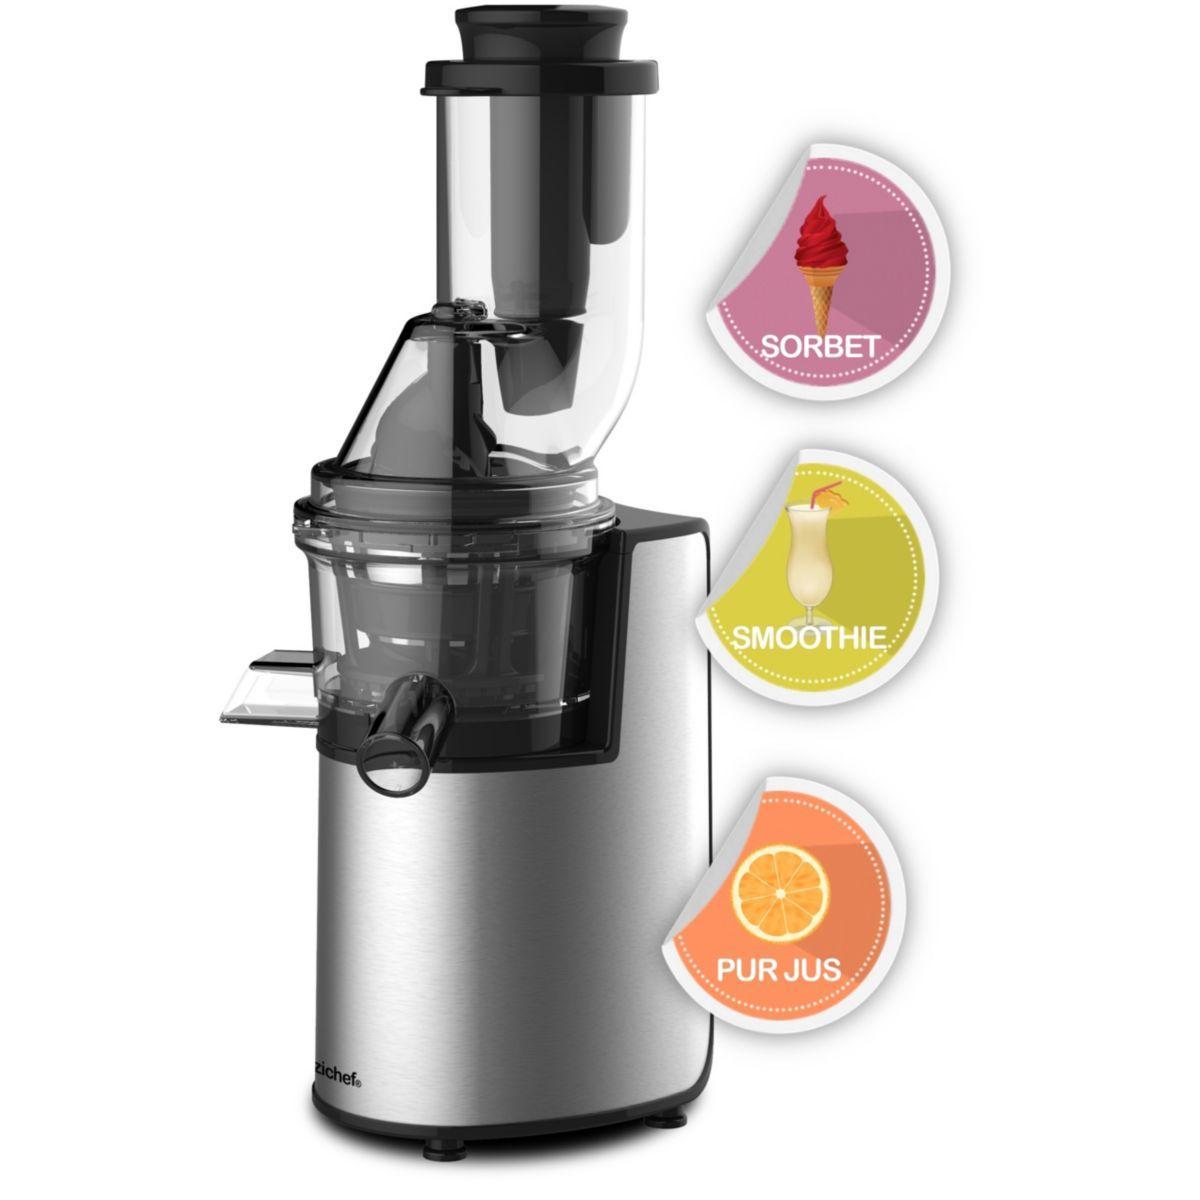 Extracteur de jus e.zichef vitamin xl smoothie et sorbet - livraison offerte : code premium (photo)